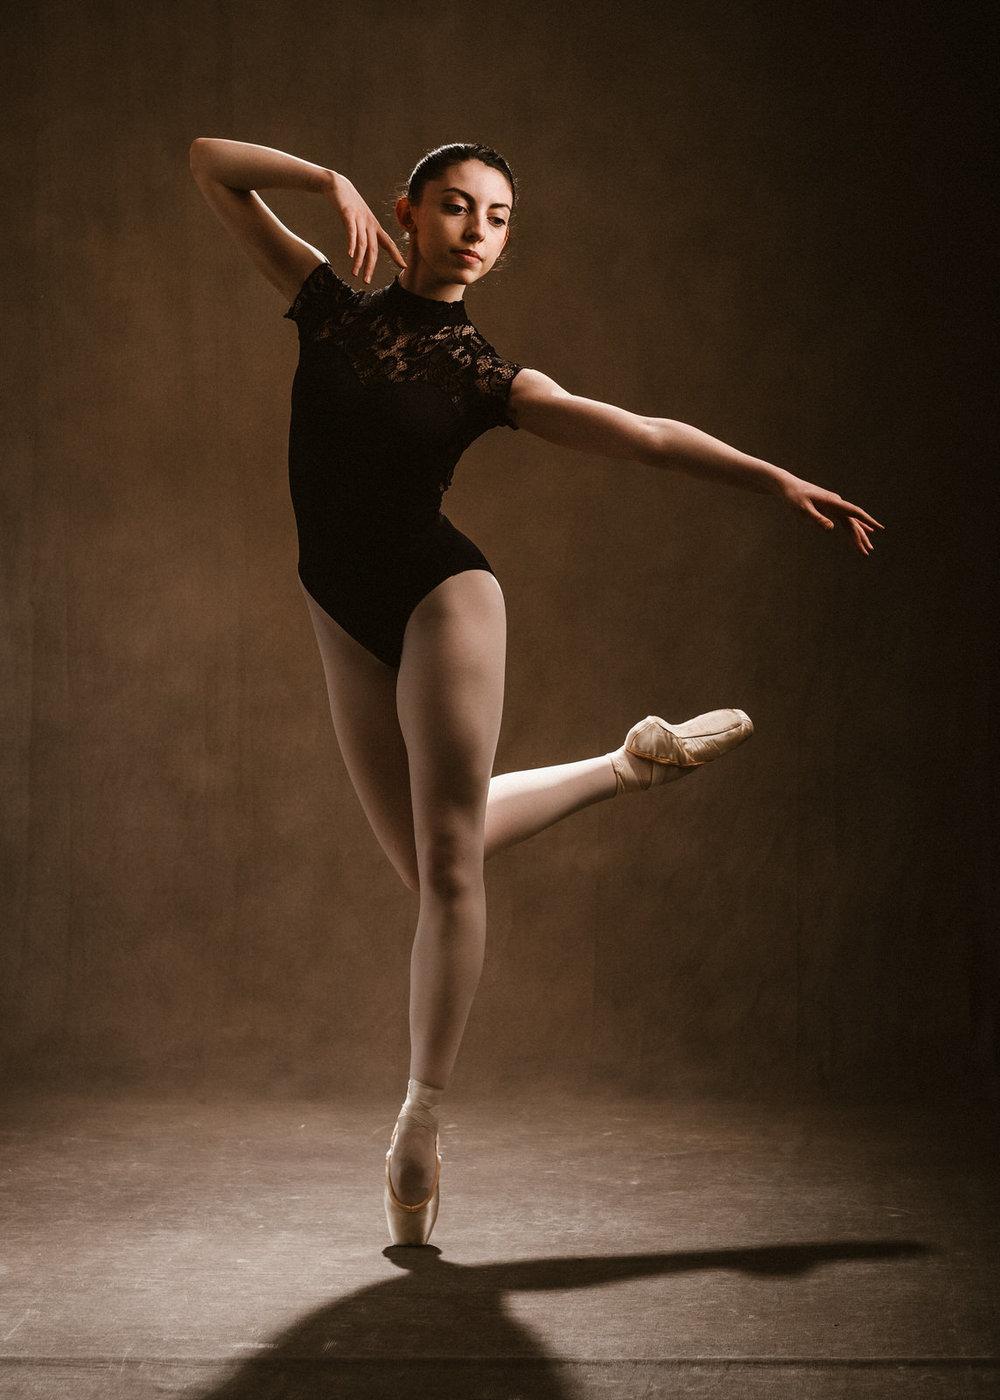 Sarah_Nolan_Ballet_002.jpg